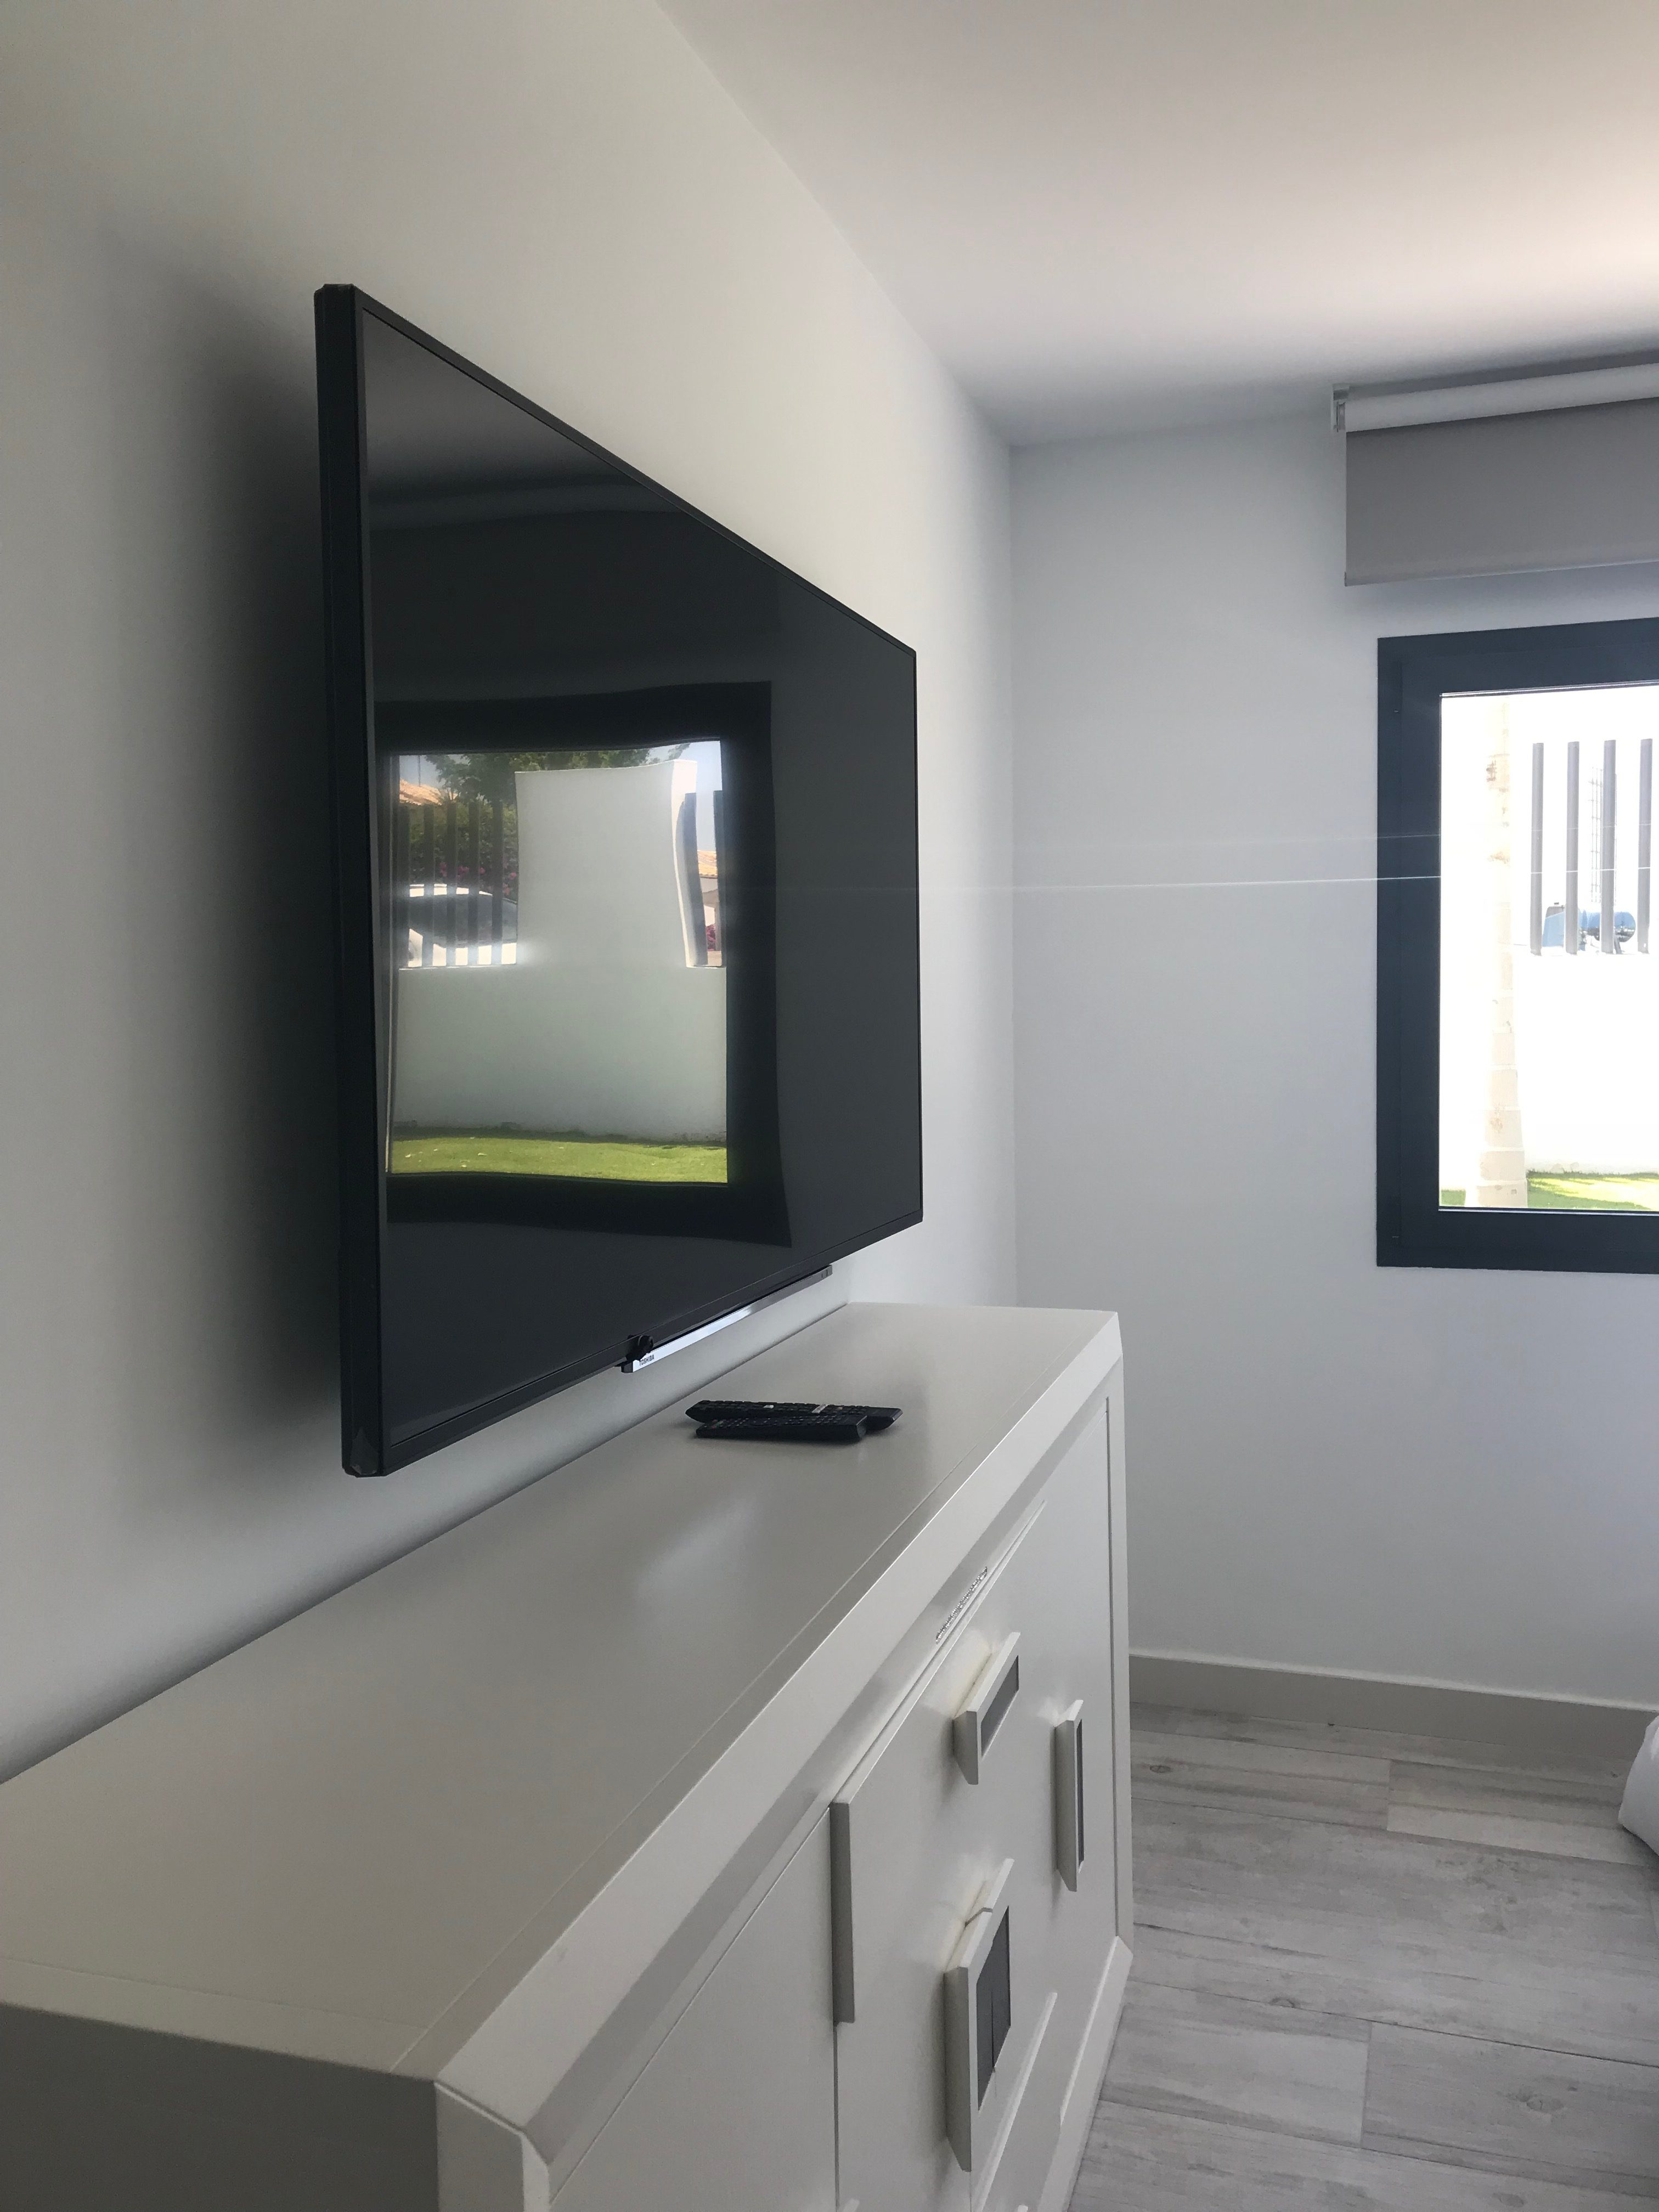 Latest Installations - TV One Spain - Costa del Sol